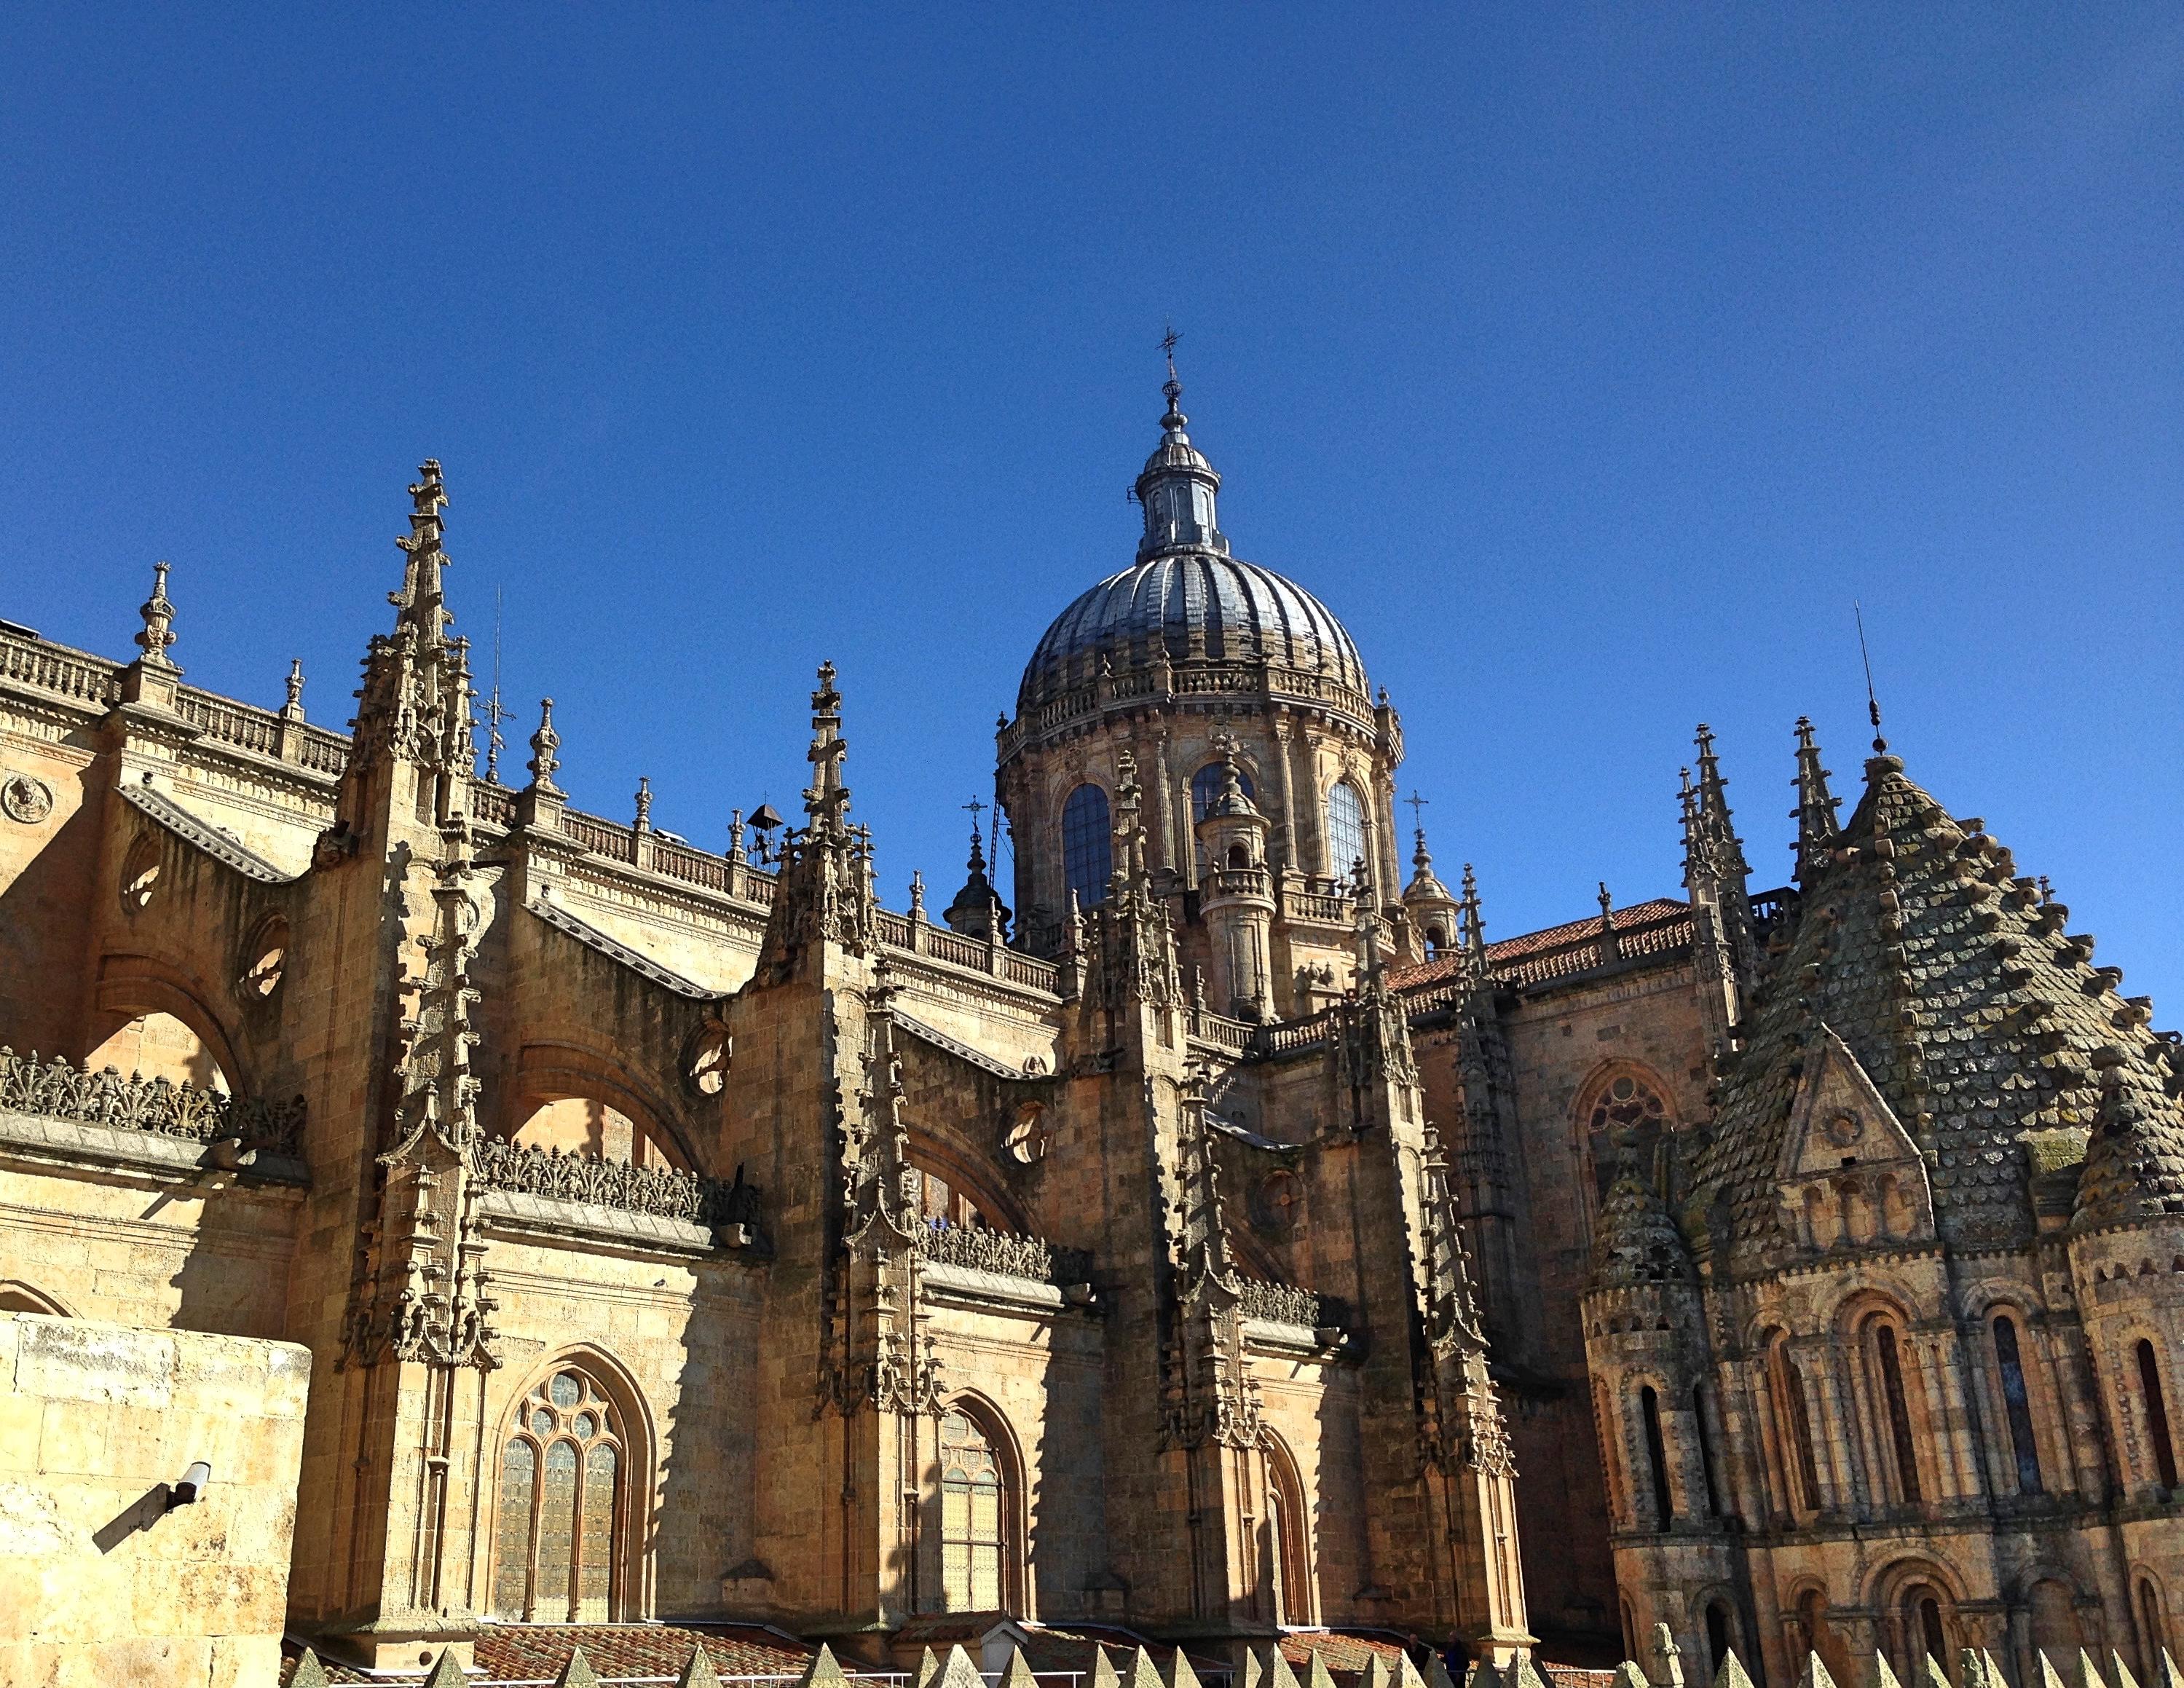 Salamanca_cathedralroof